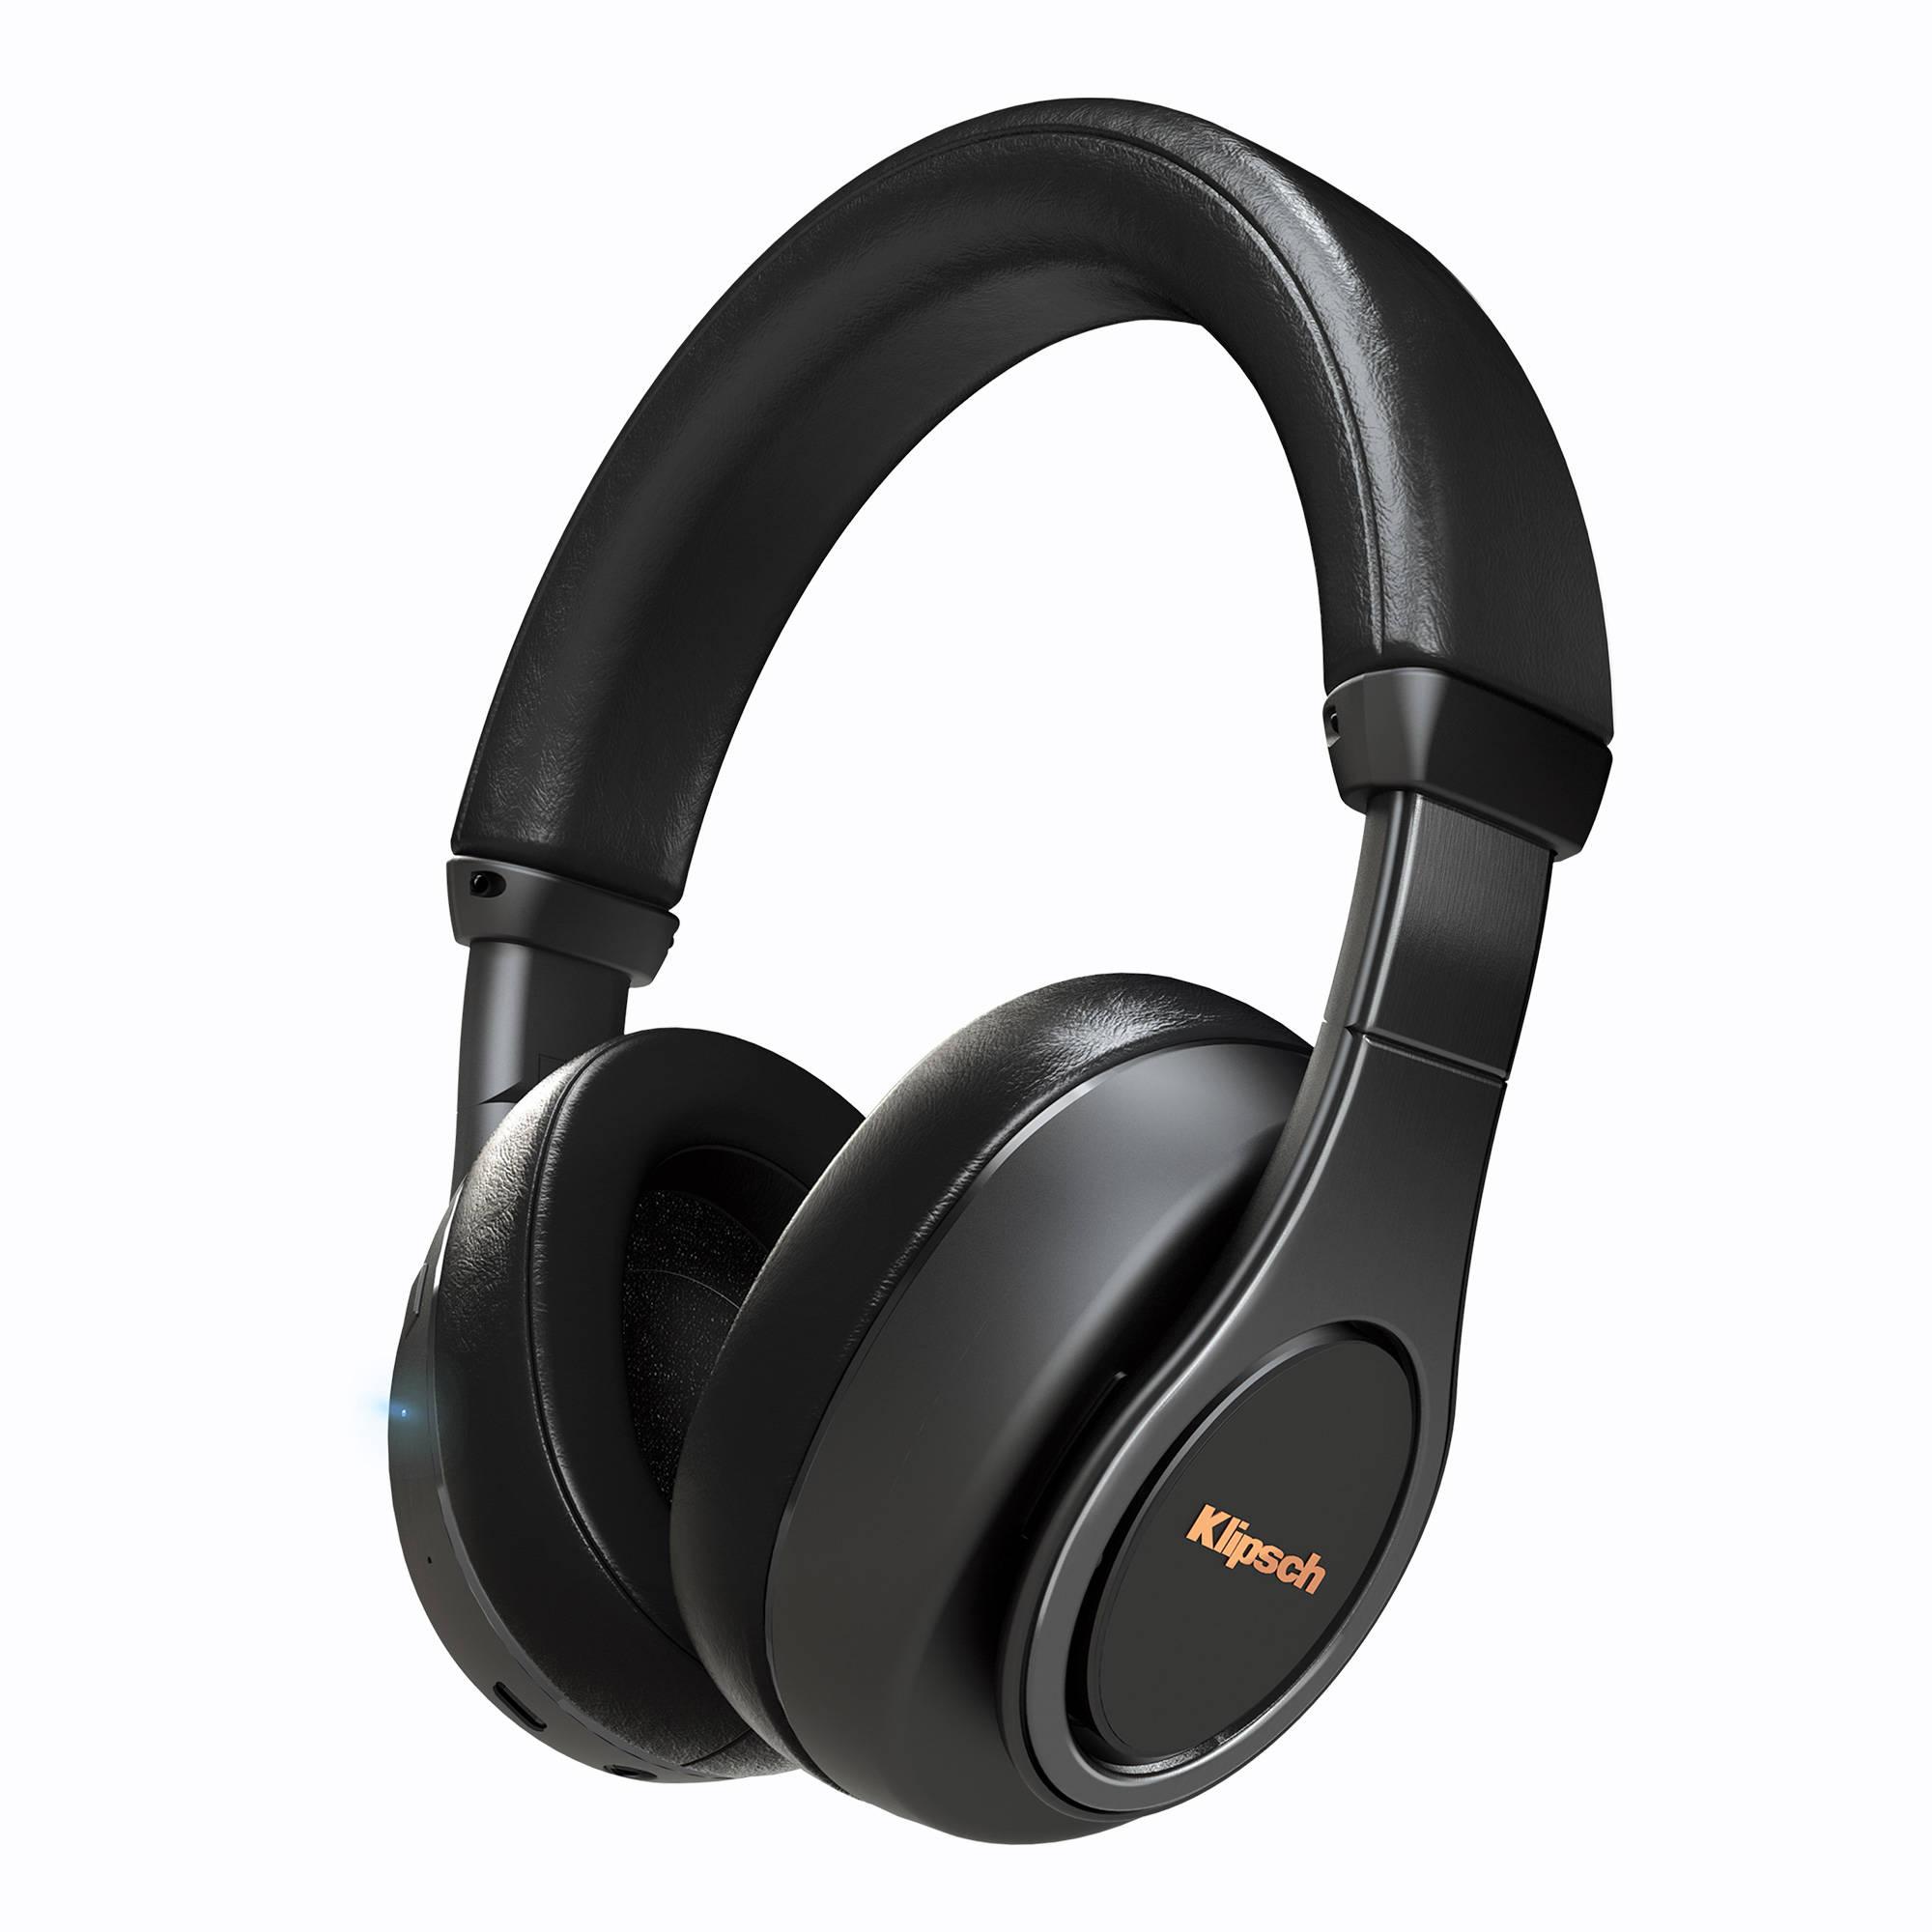 Klipsch Reference Over-Ear Bluetooth Headphones (Black